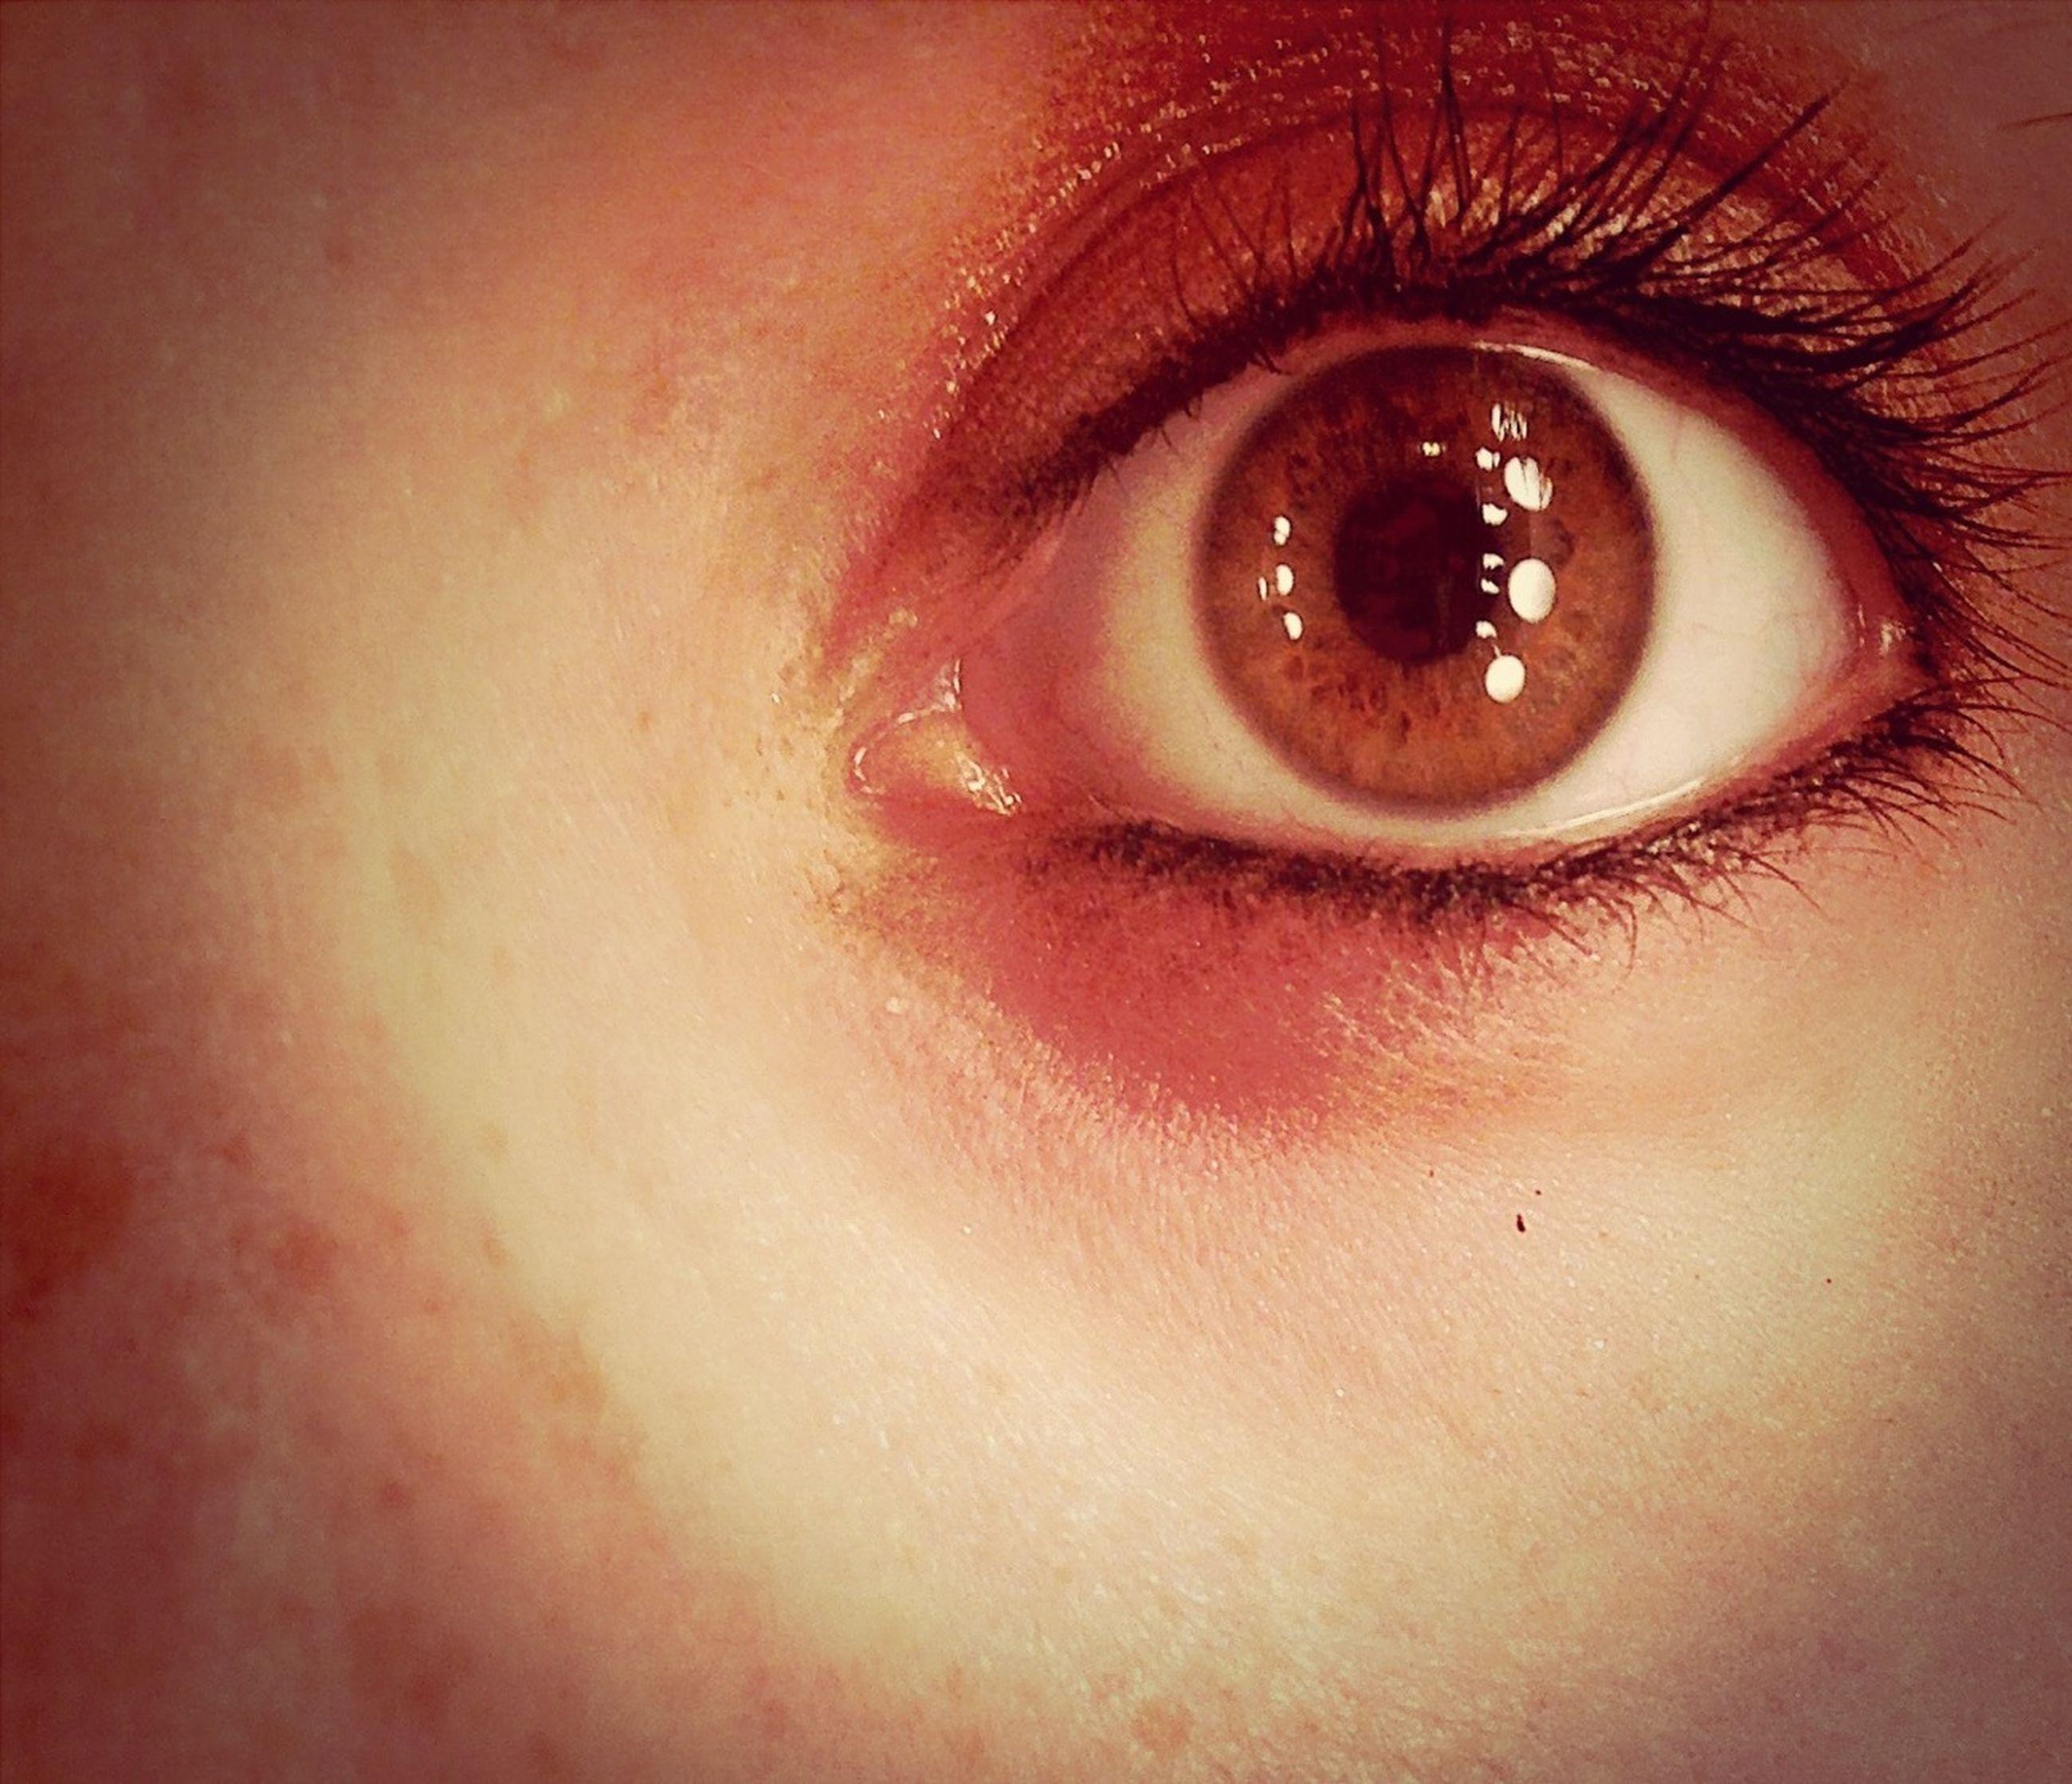 human eye, close-up, eyelash, looking at camera, portrait, eyesight, indoors, human face, human skin, extreme close-up, headshot, part of, lifestyles, young adult, sensory perception, eyebrow, iris - eye